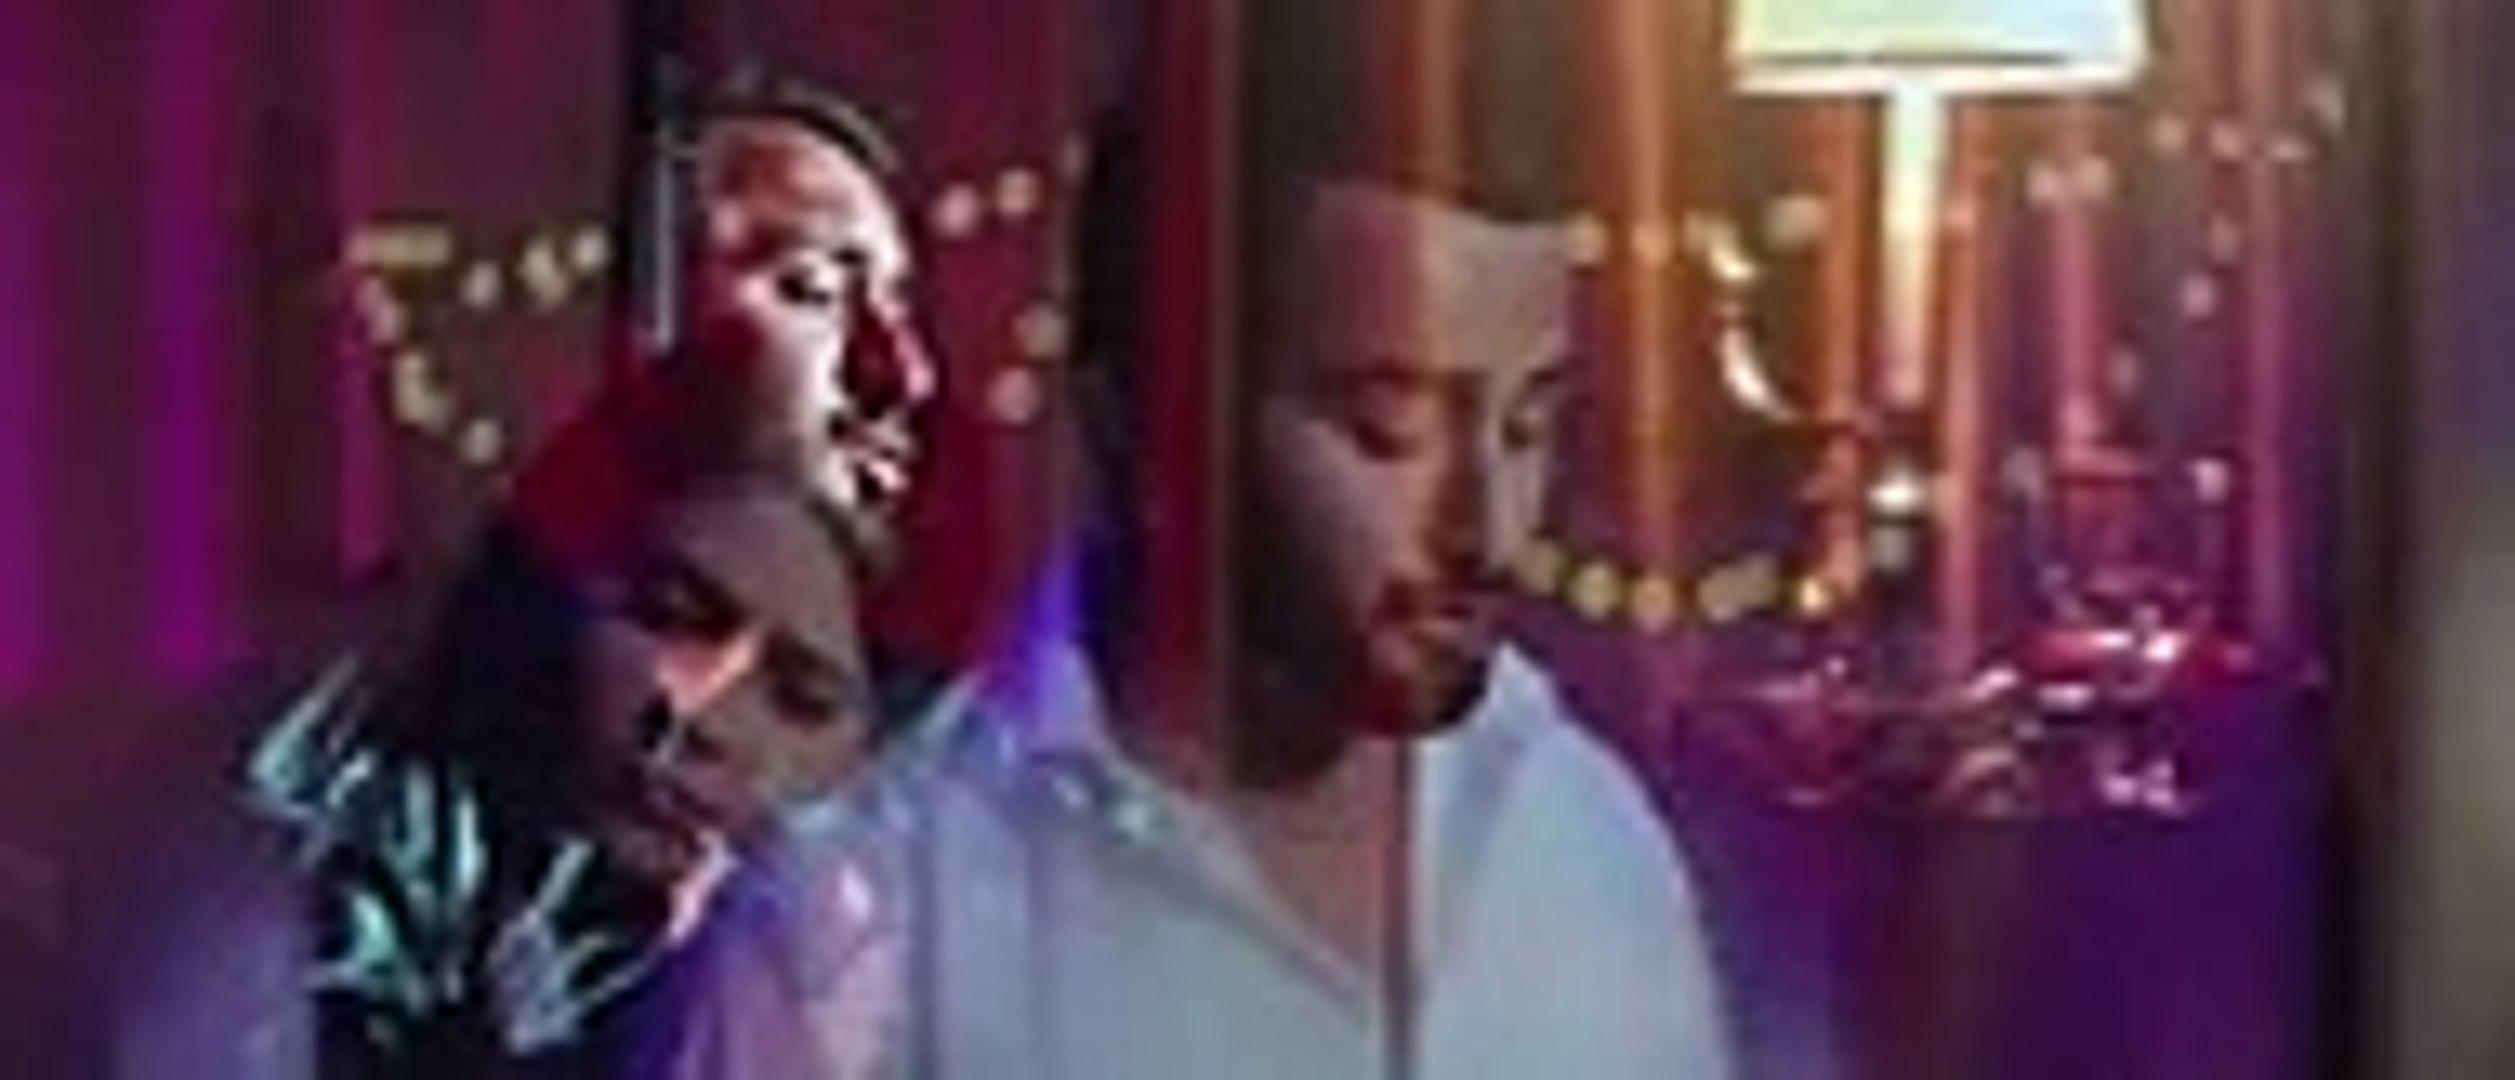 Ali Khokhar Tumharay Liye Video Song top songs best songs new songs upcoming songs latest songs sad